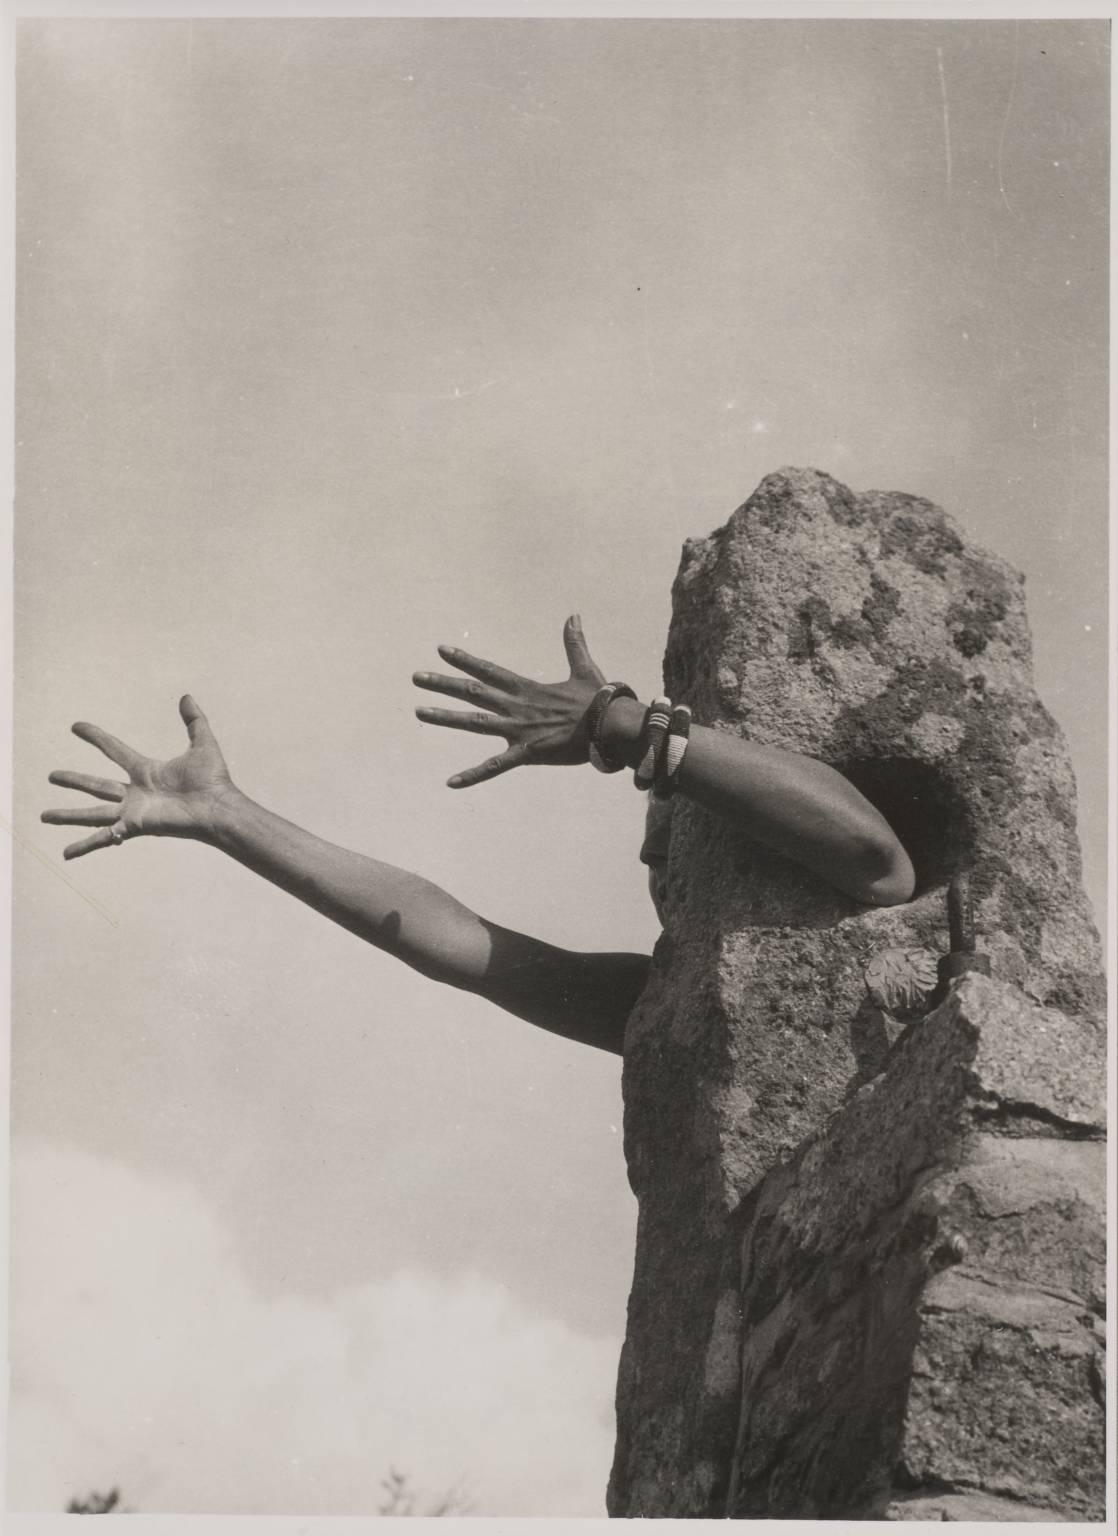 Je tends les bras , Claude Cahun, 1931